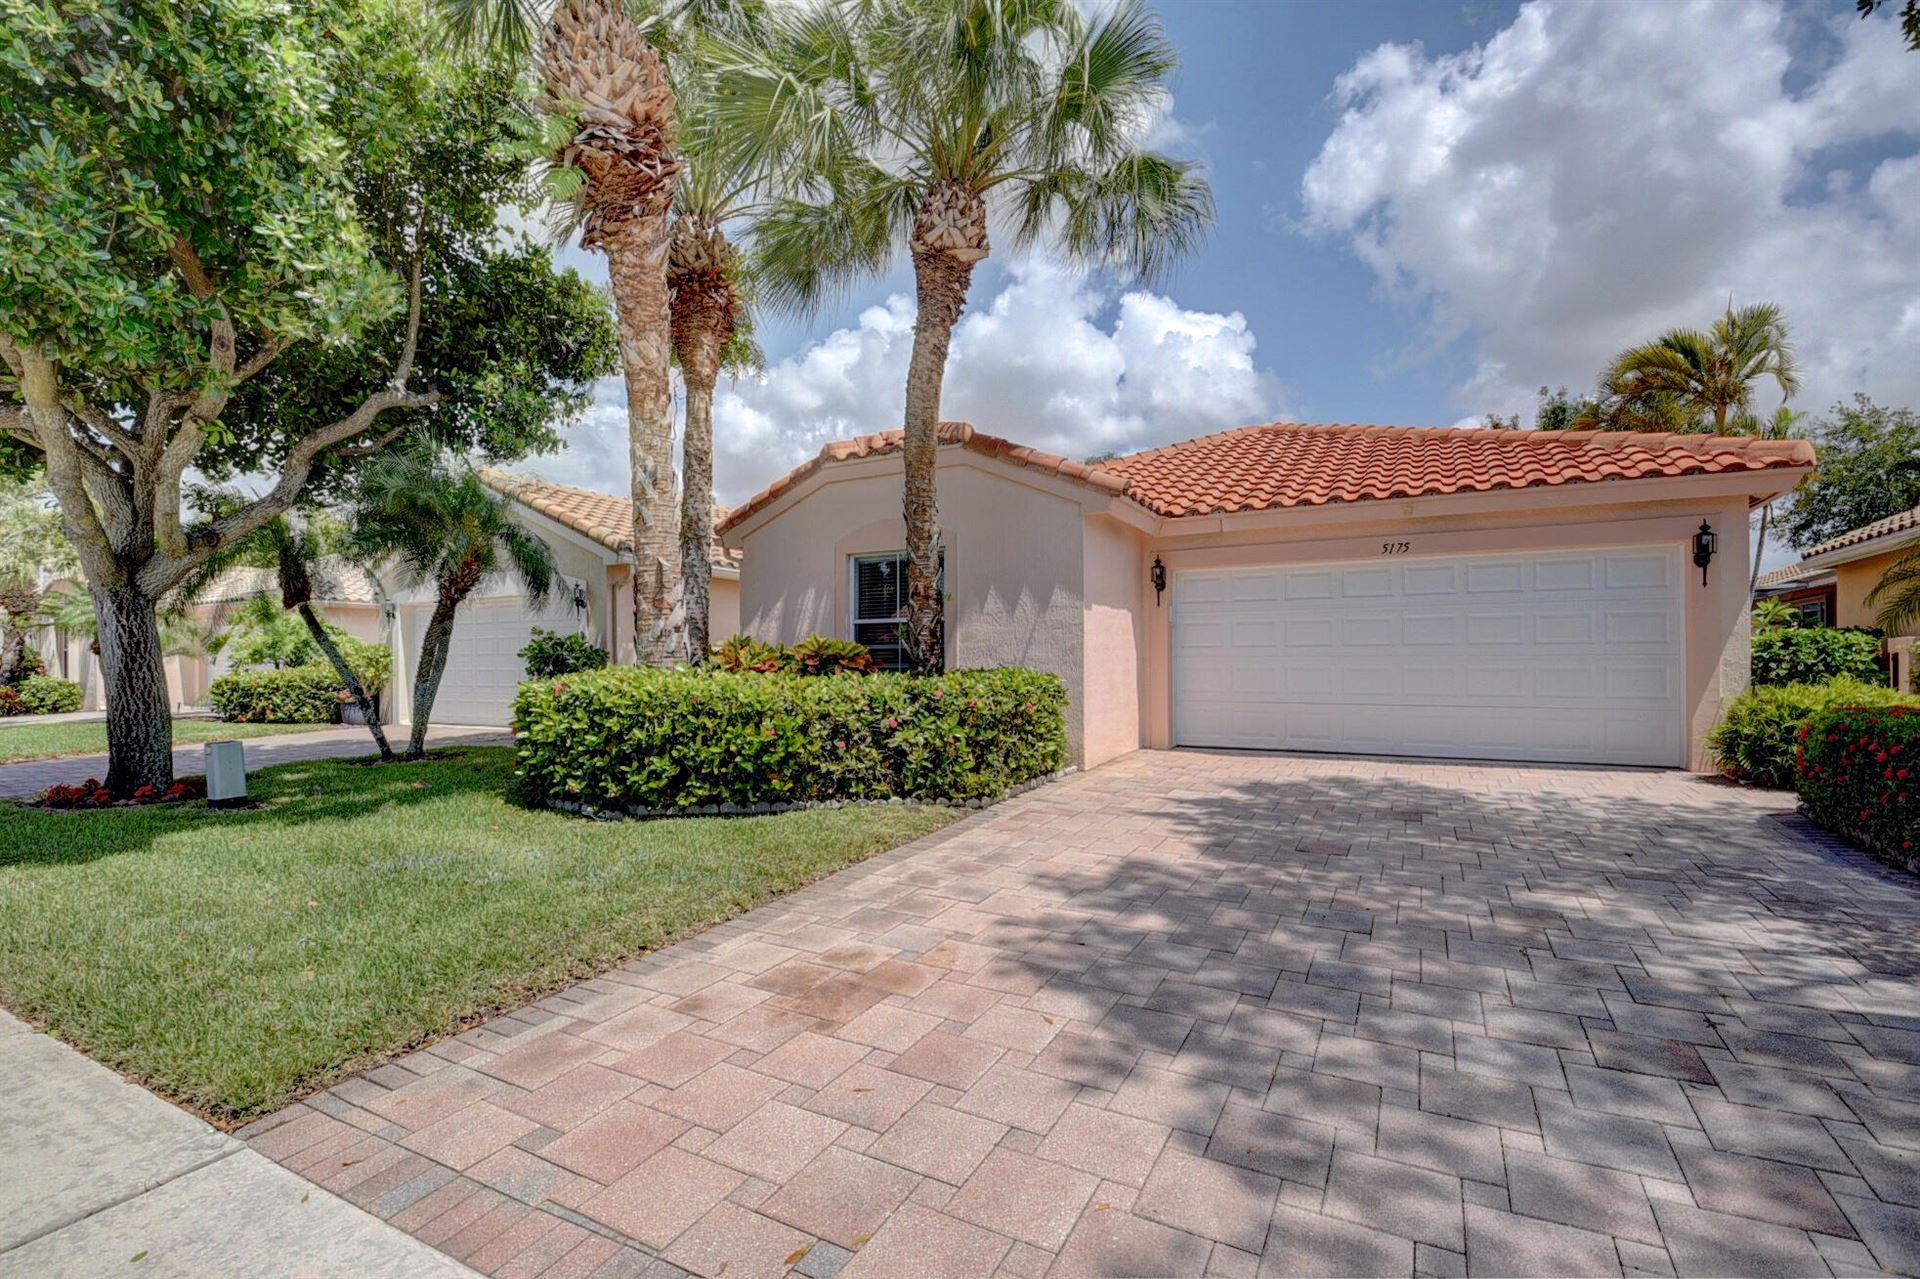 5175 Corbel Lake Way, Boynton Beach, FL 33437 - MLS#: RX-10718106